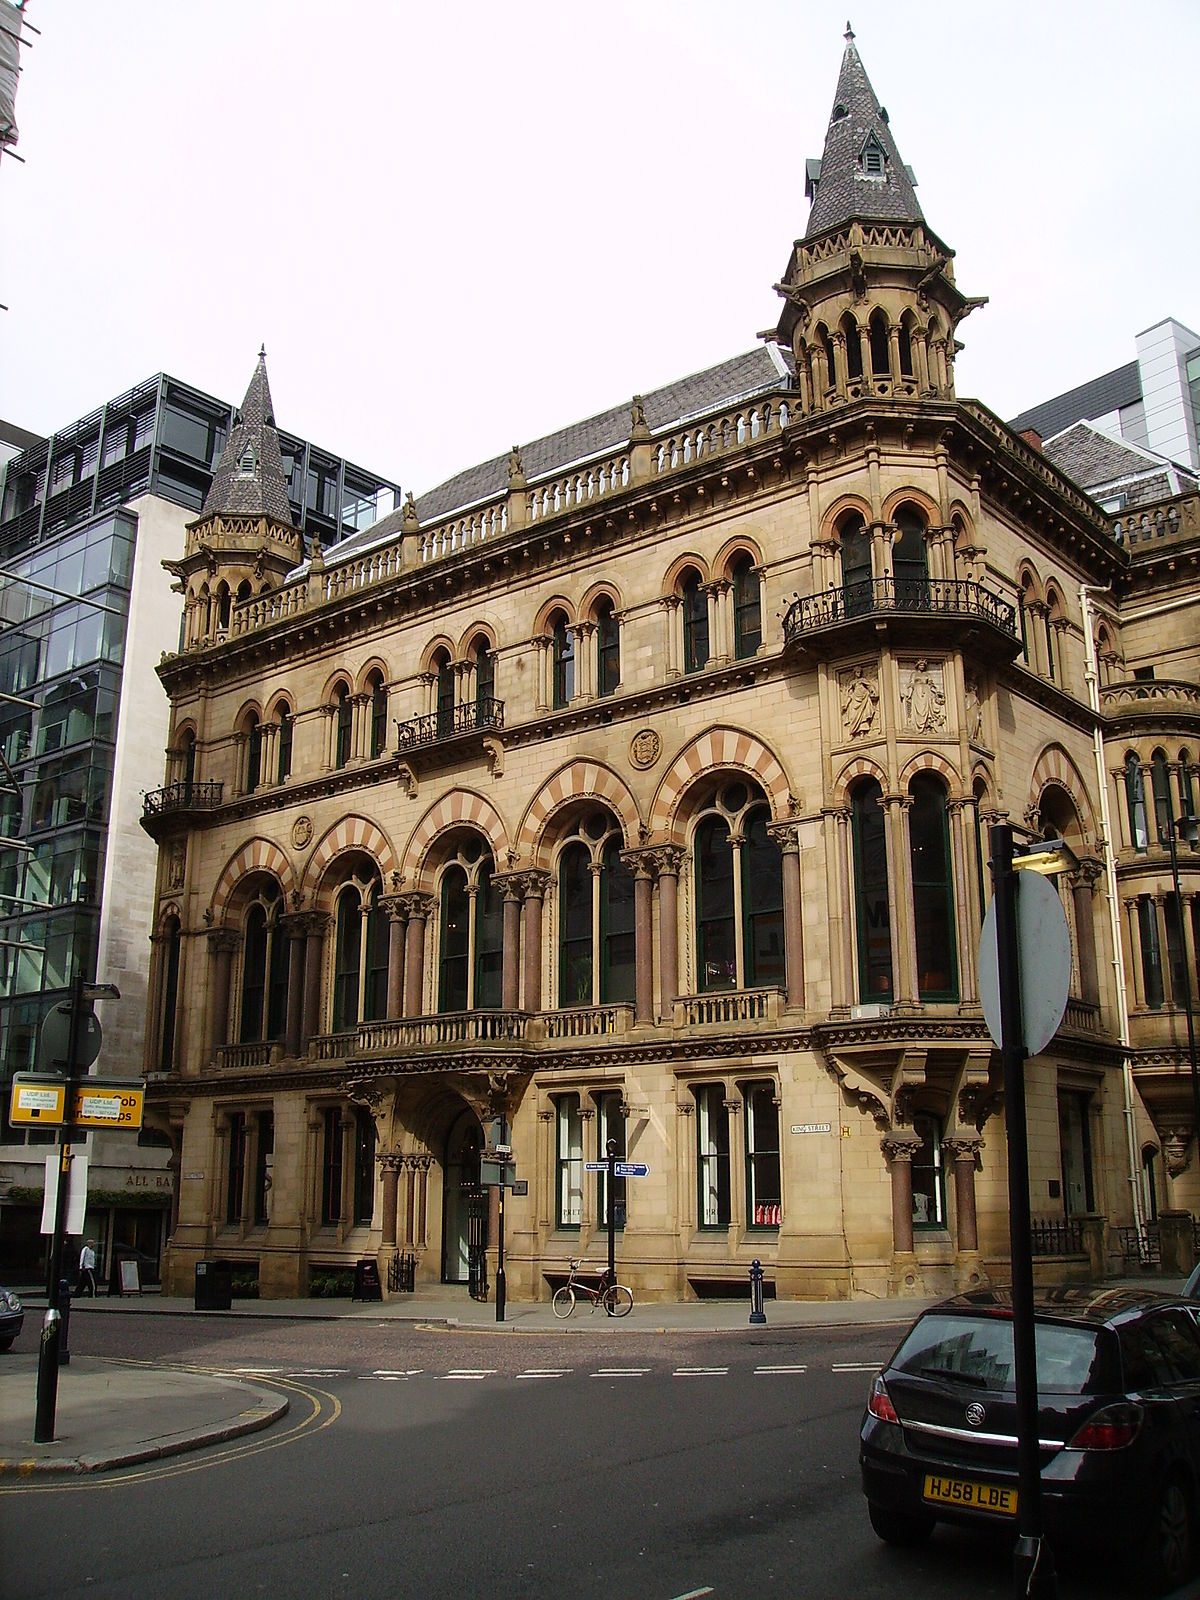 Manchester Reform Club - Wikipedia